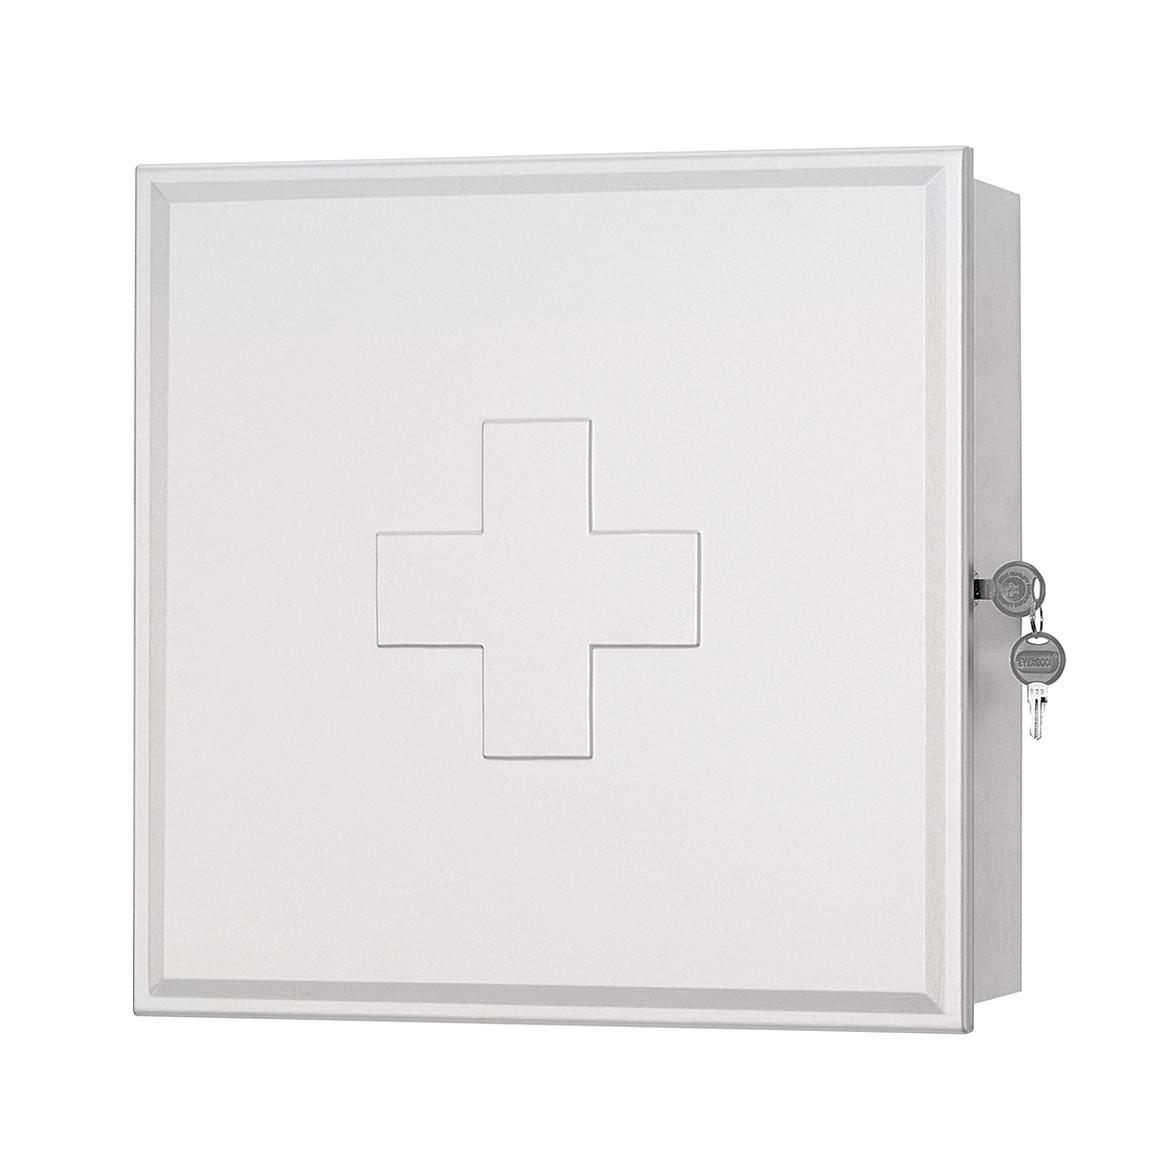 Medizinschrank Medibox - Weiß, Sieper